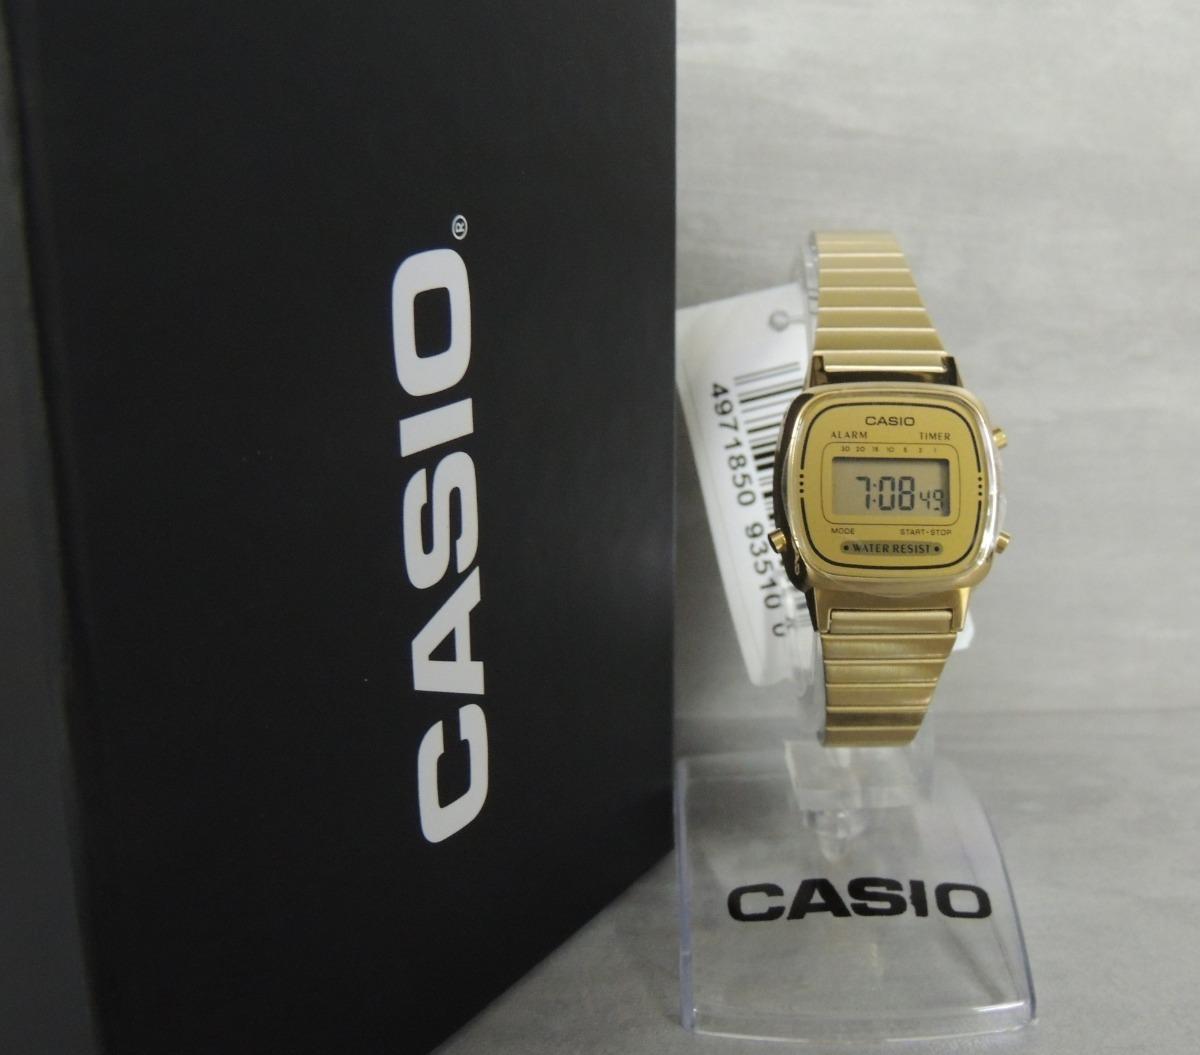 7c2d11681e8 relógio casio vintage mini la670wga-9df - nf e garantia. Carregando zoom.